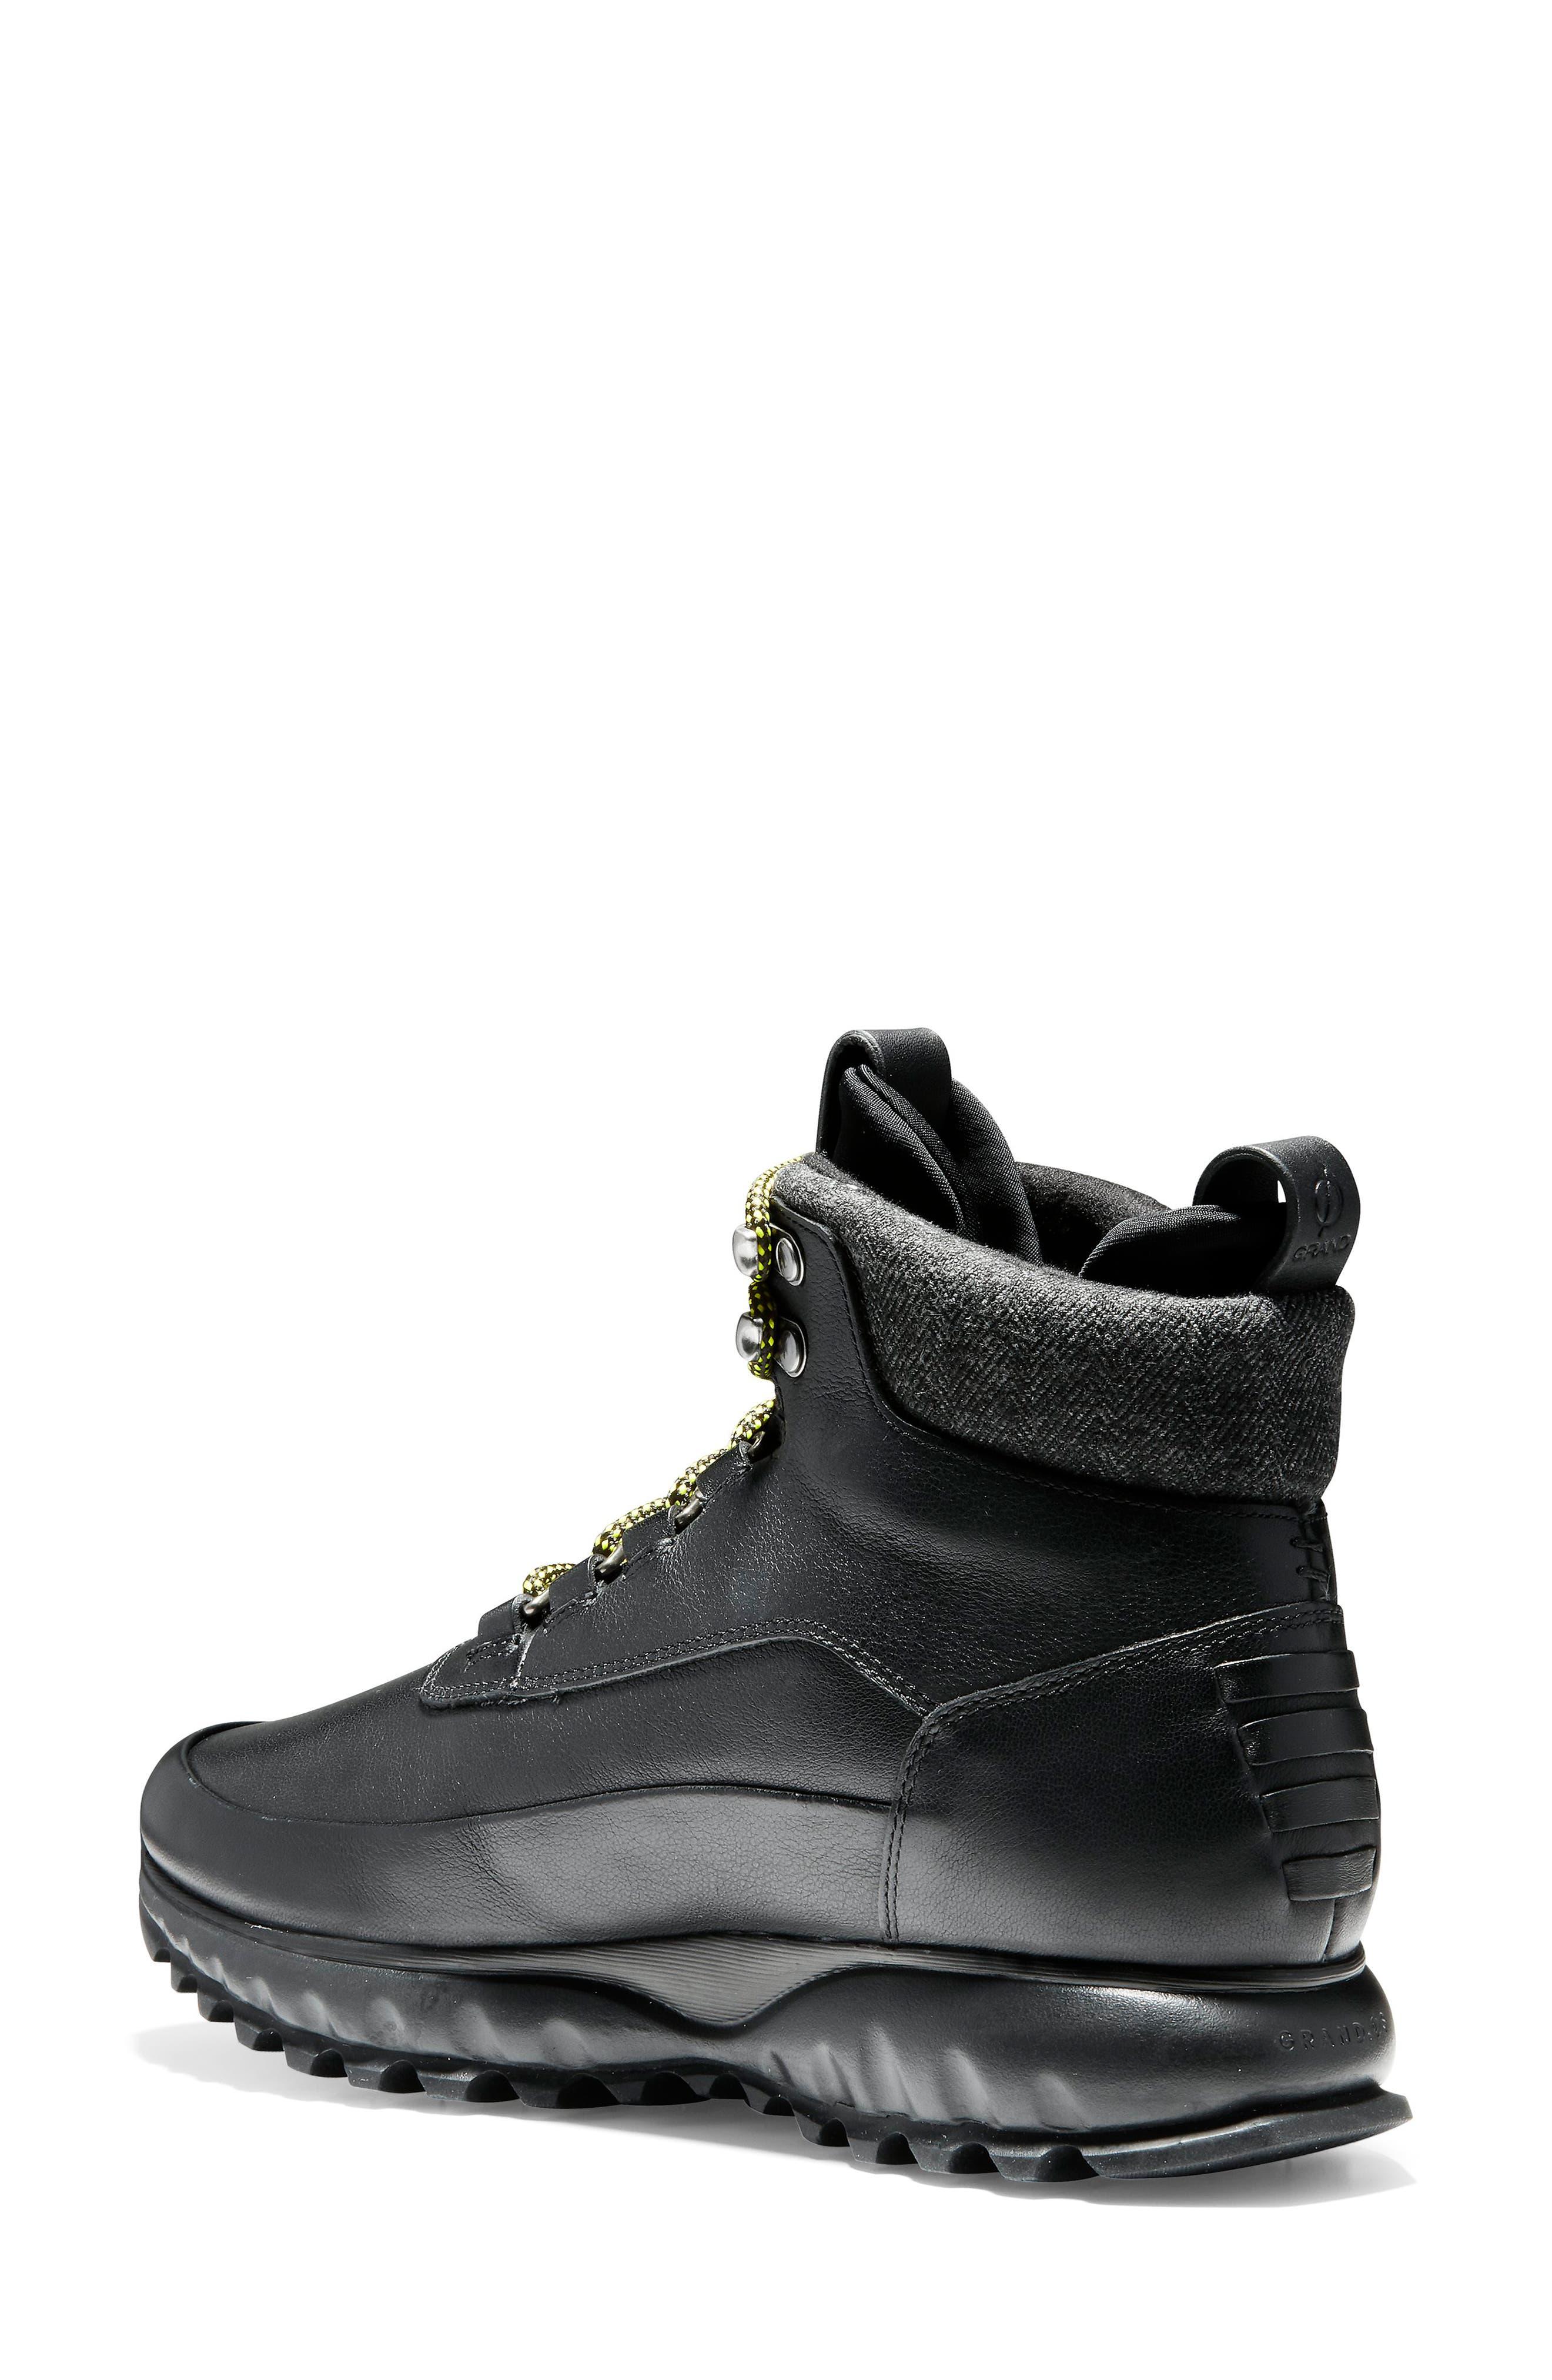 GrandExplore All Terrain Waterproof Hiking Boot,                             Alternate thumbnail 2, color,                             BLACK WATERPROOF LEATHER